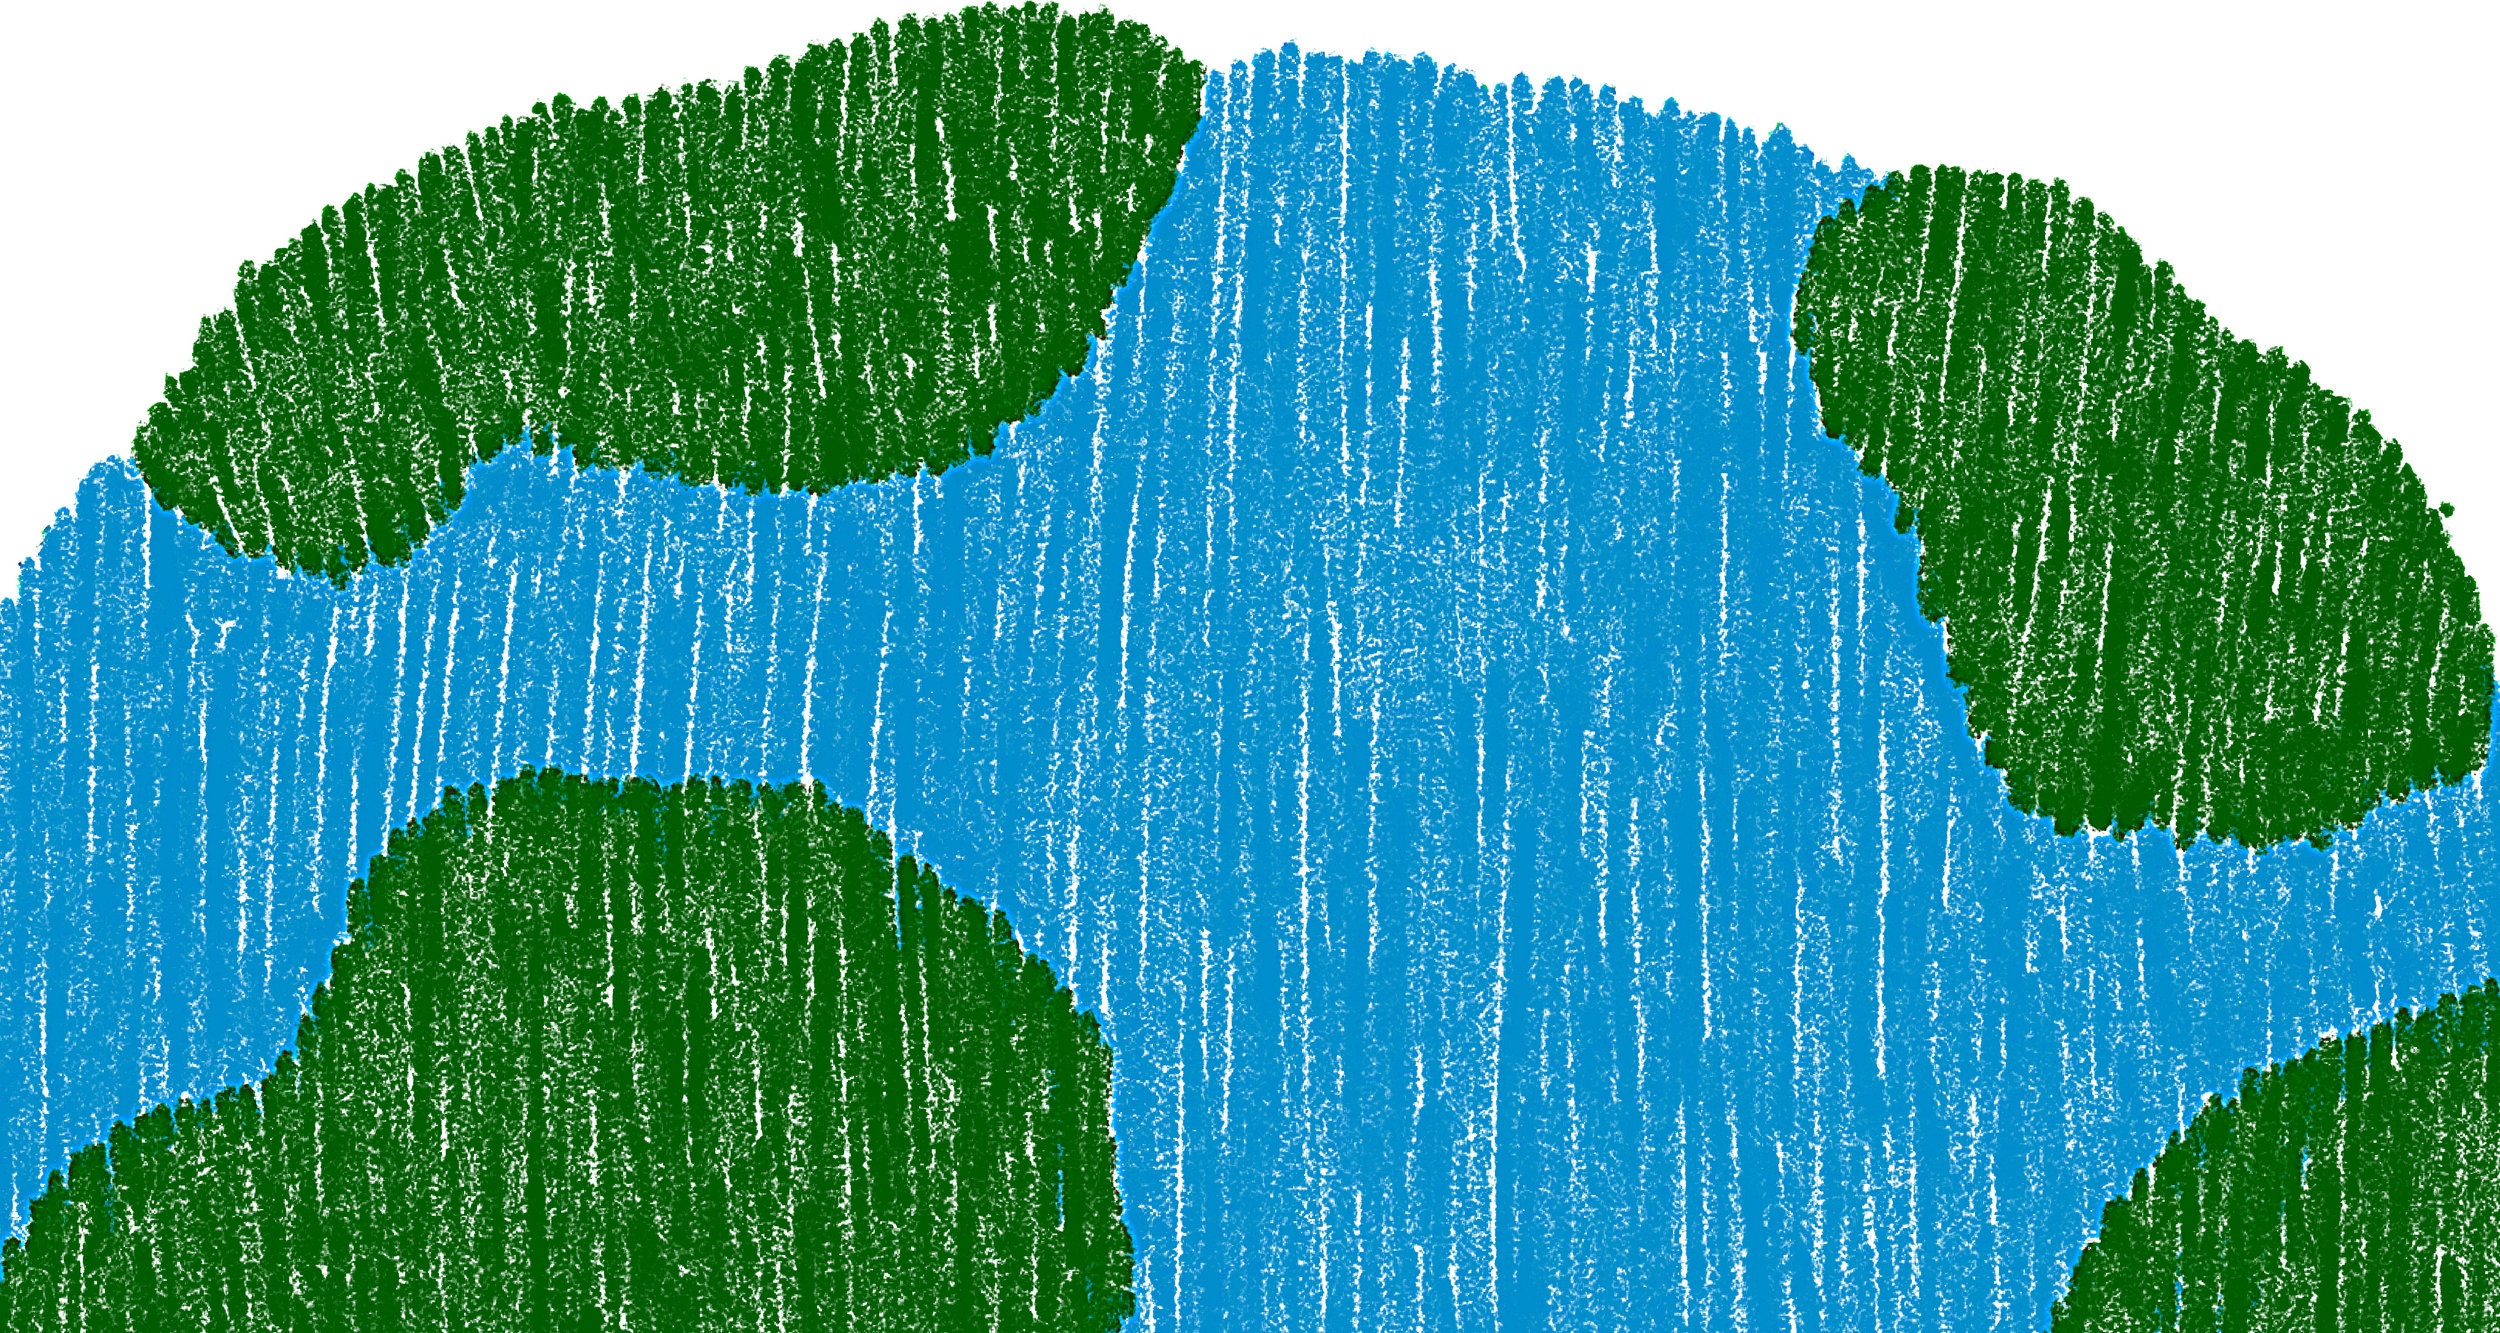 jorden-ritad.jpg